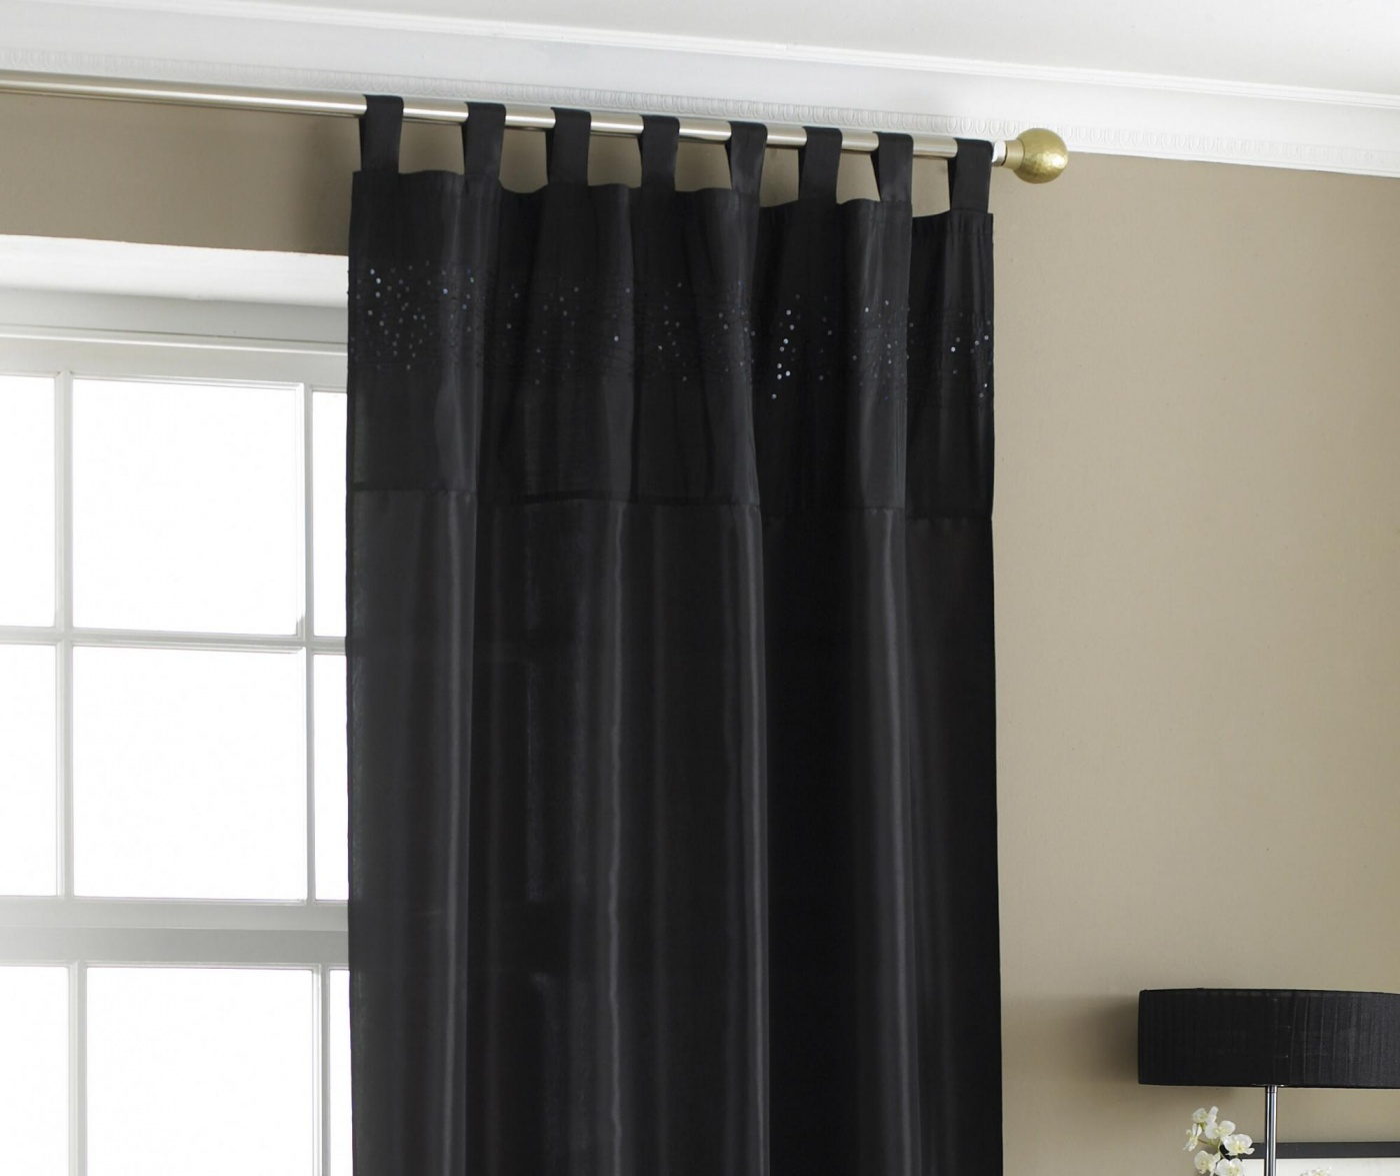 Draperie Taffeta Bit Black 145x228 cm